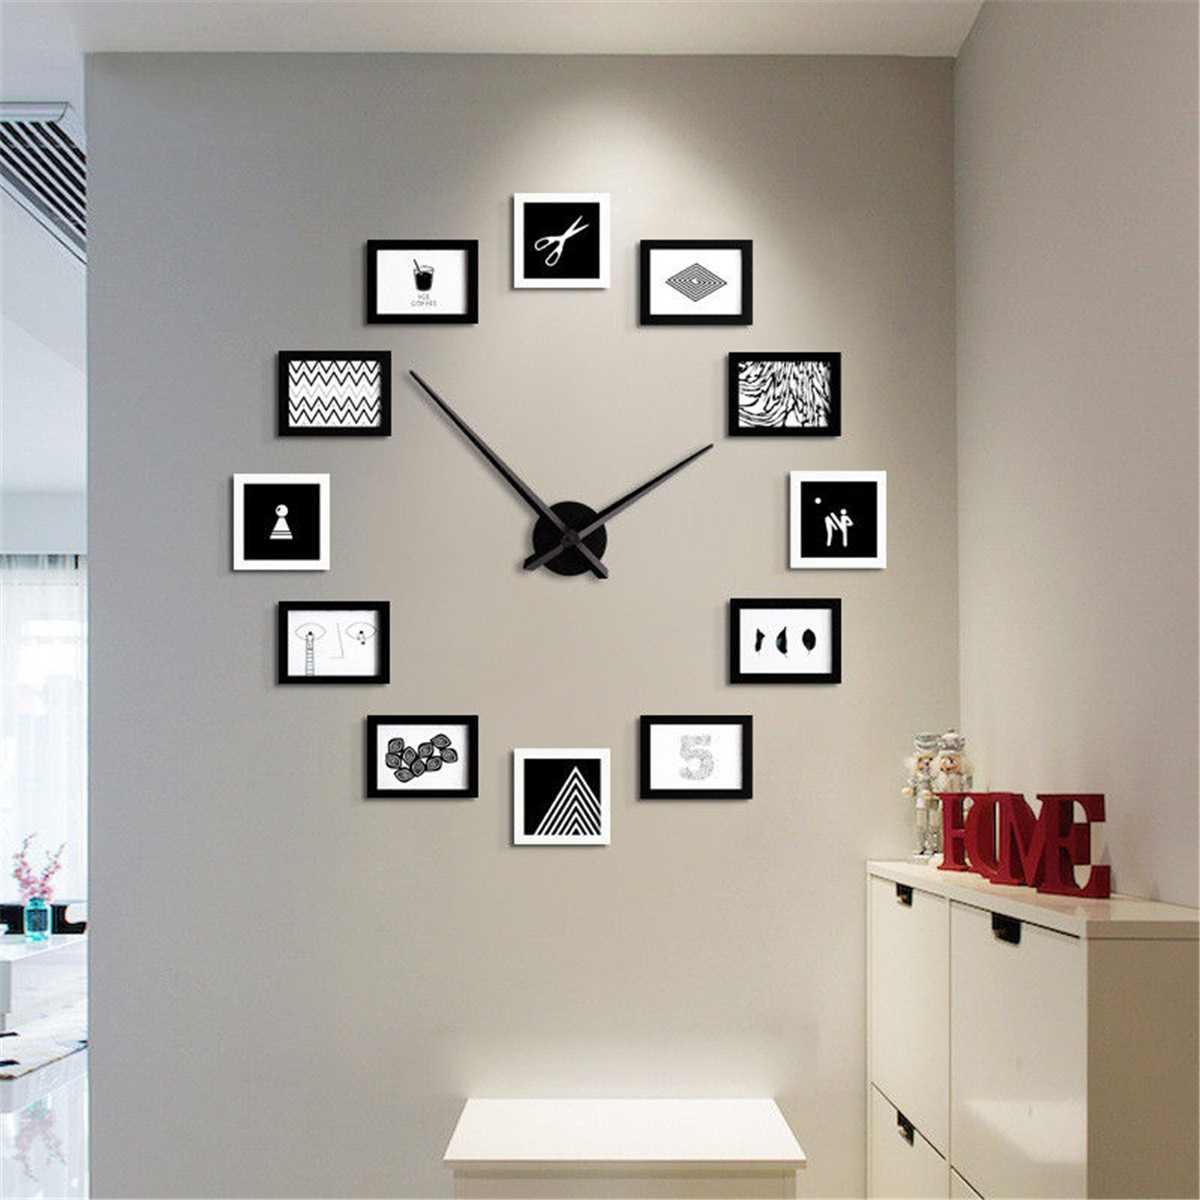 2019 12 Photo Frames Nordic Style DIY Wall Clock Modern Design Wood Photo Frame Clock Art Pictures Clock Unique Klok Home Decor